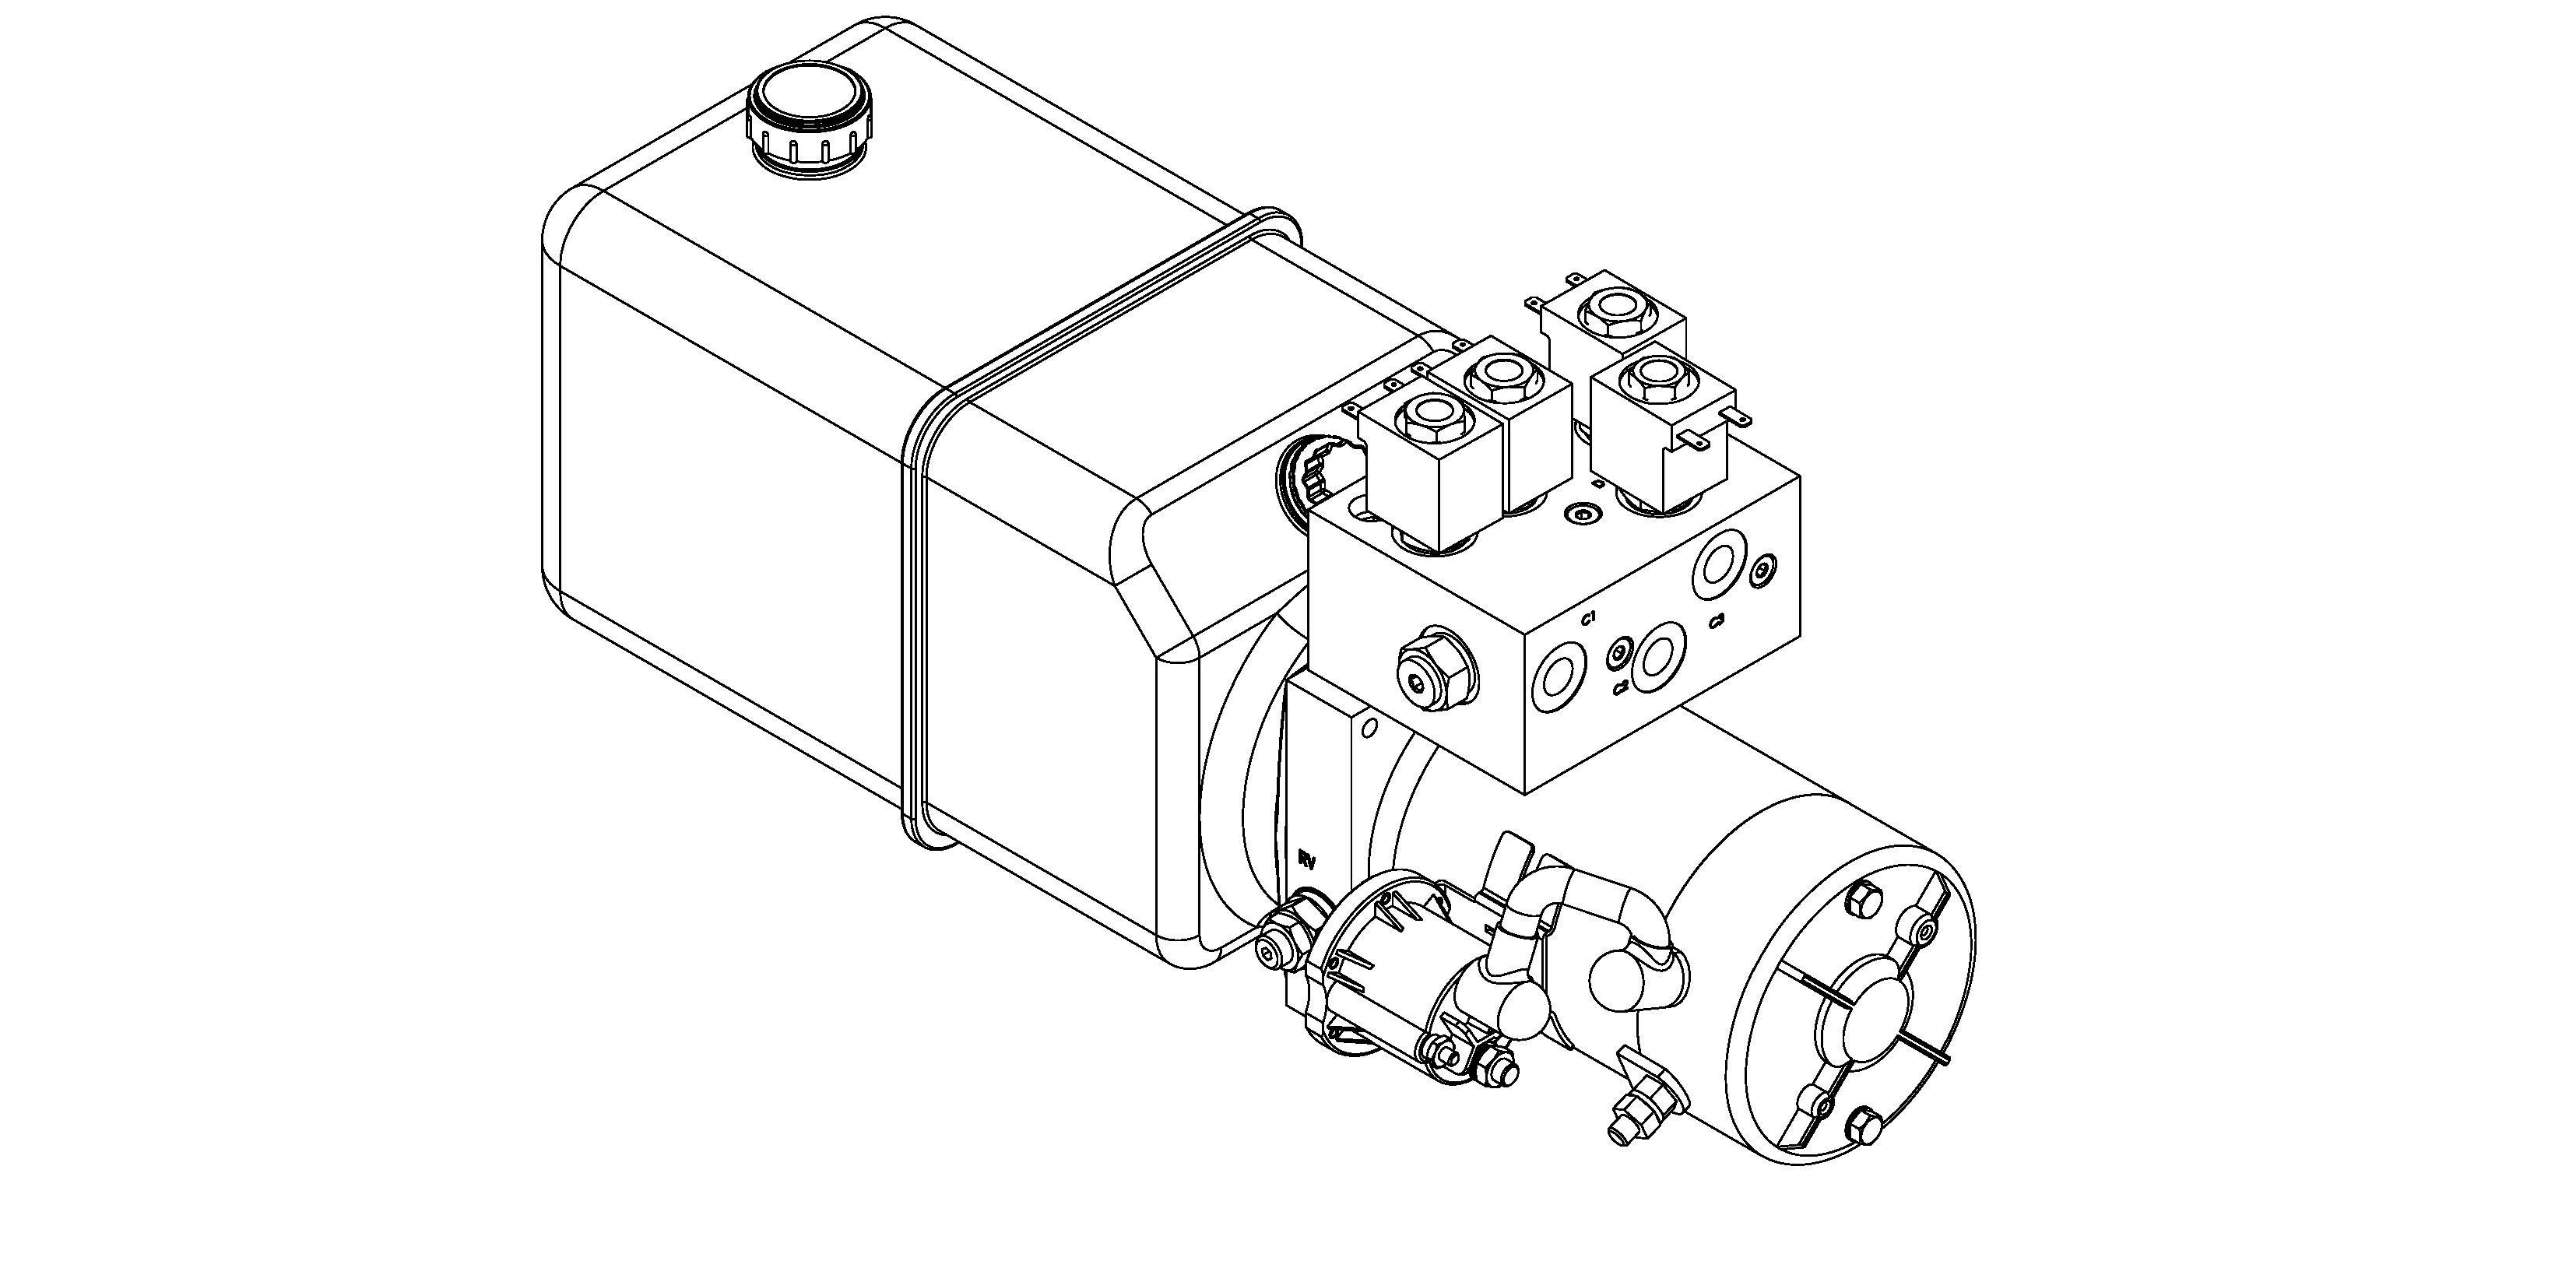 forklift-small hydraulic Power unit